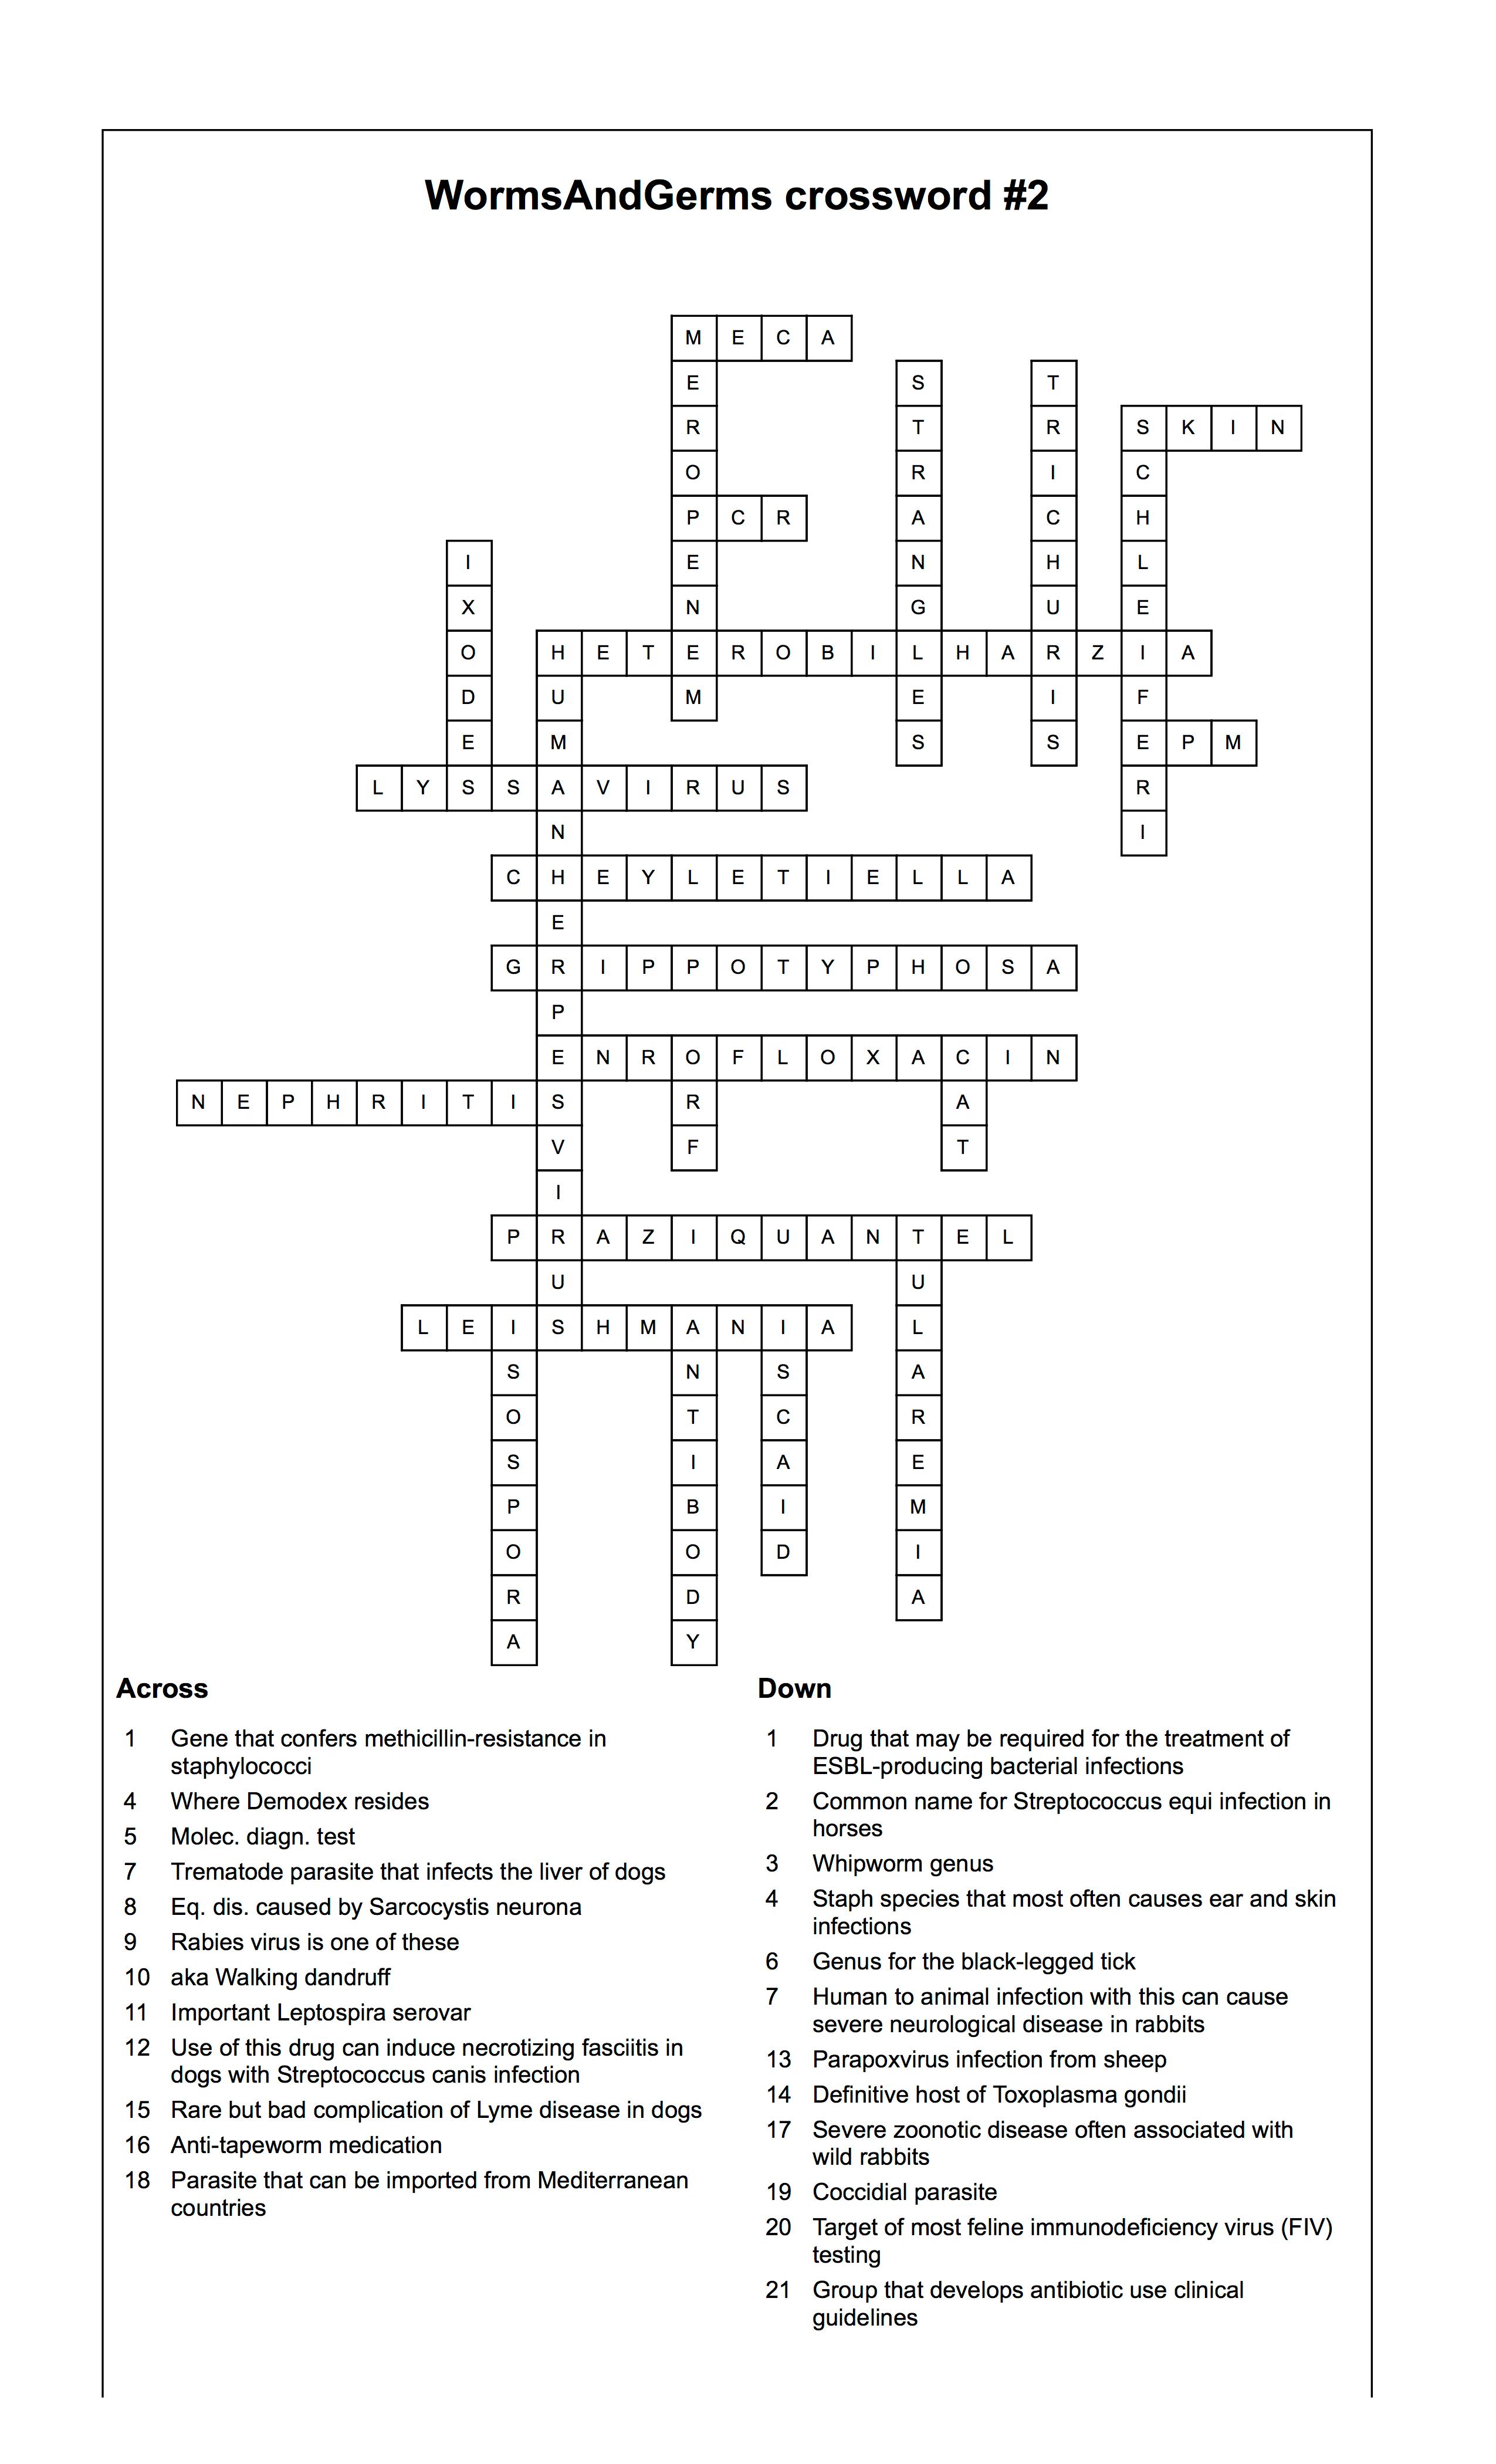 Crossword 2 Answers